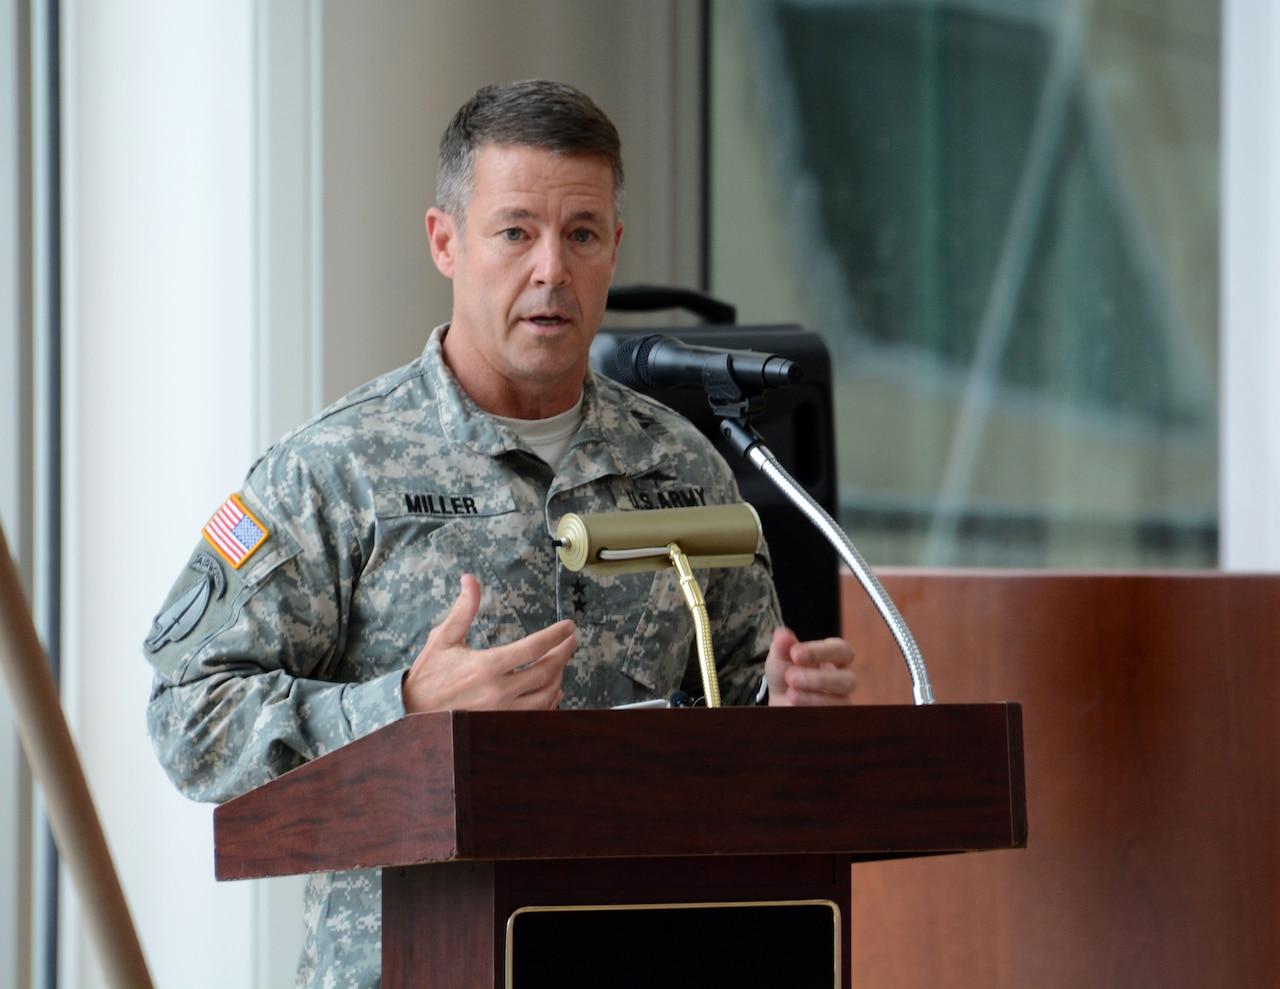 Army Maj. Gen. Austin S. Miller speaks at a ceremony at Fort Benning, Ga., in 2015.